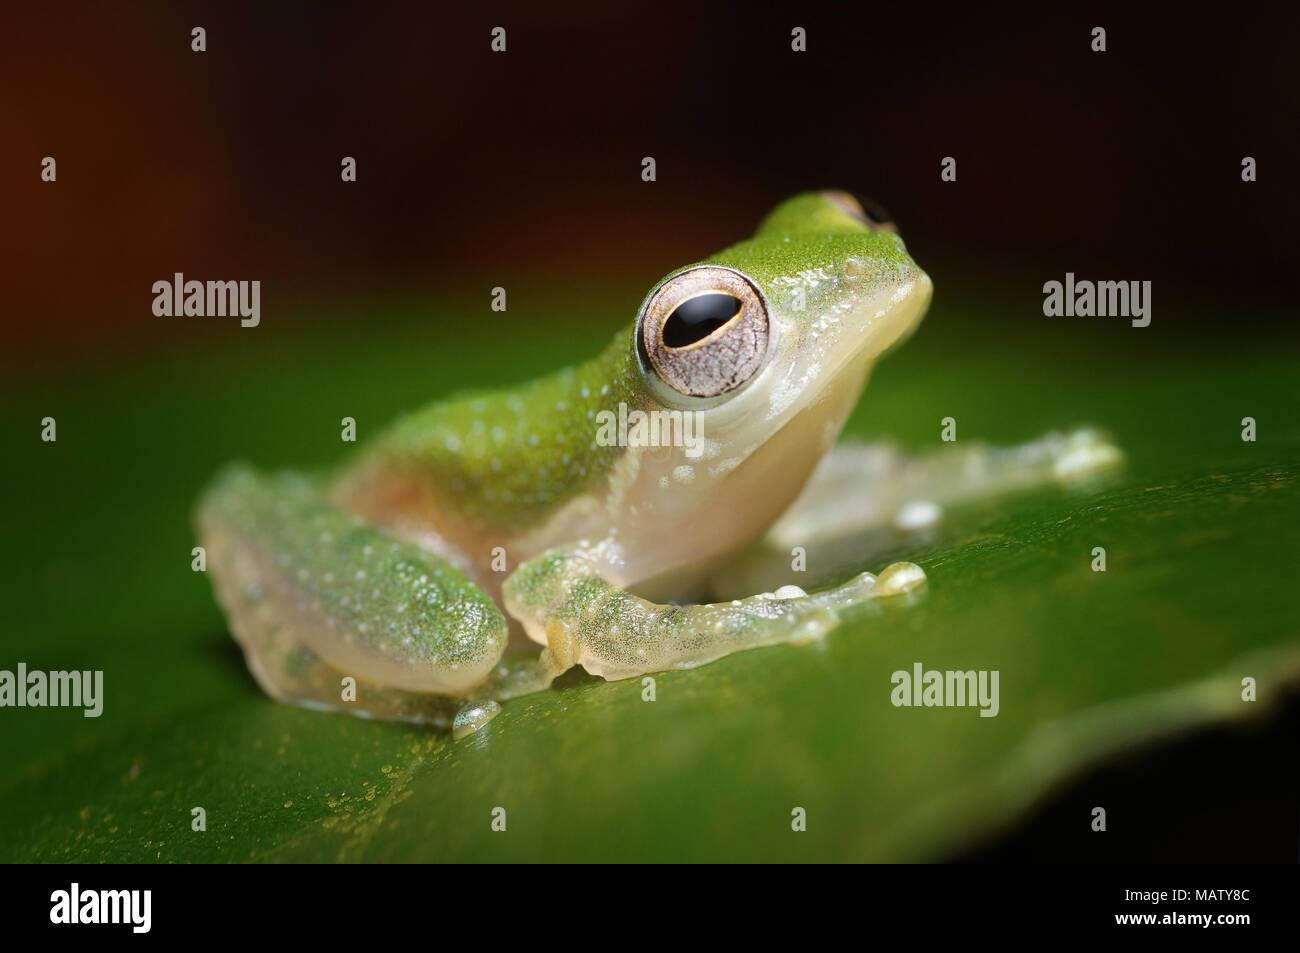 White-eared tree frog Rhacophorus kajau - Stock Image